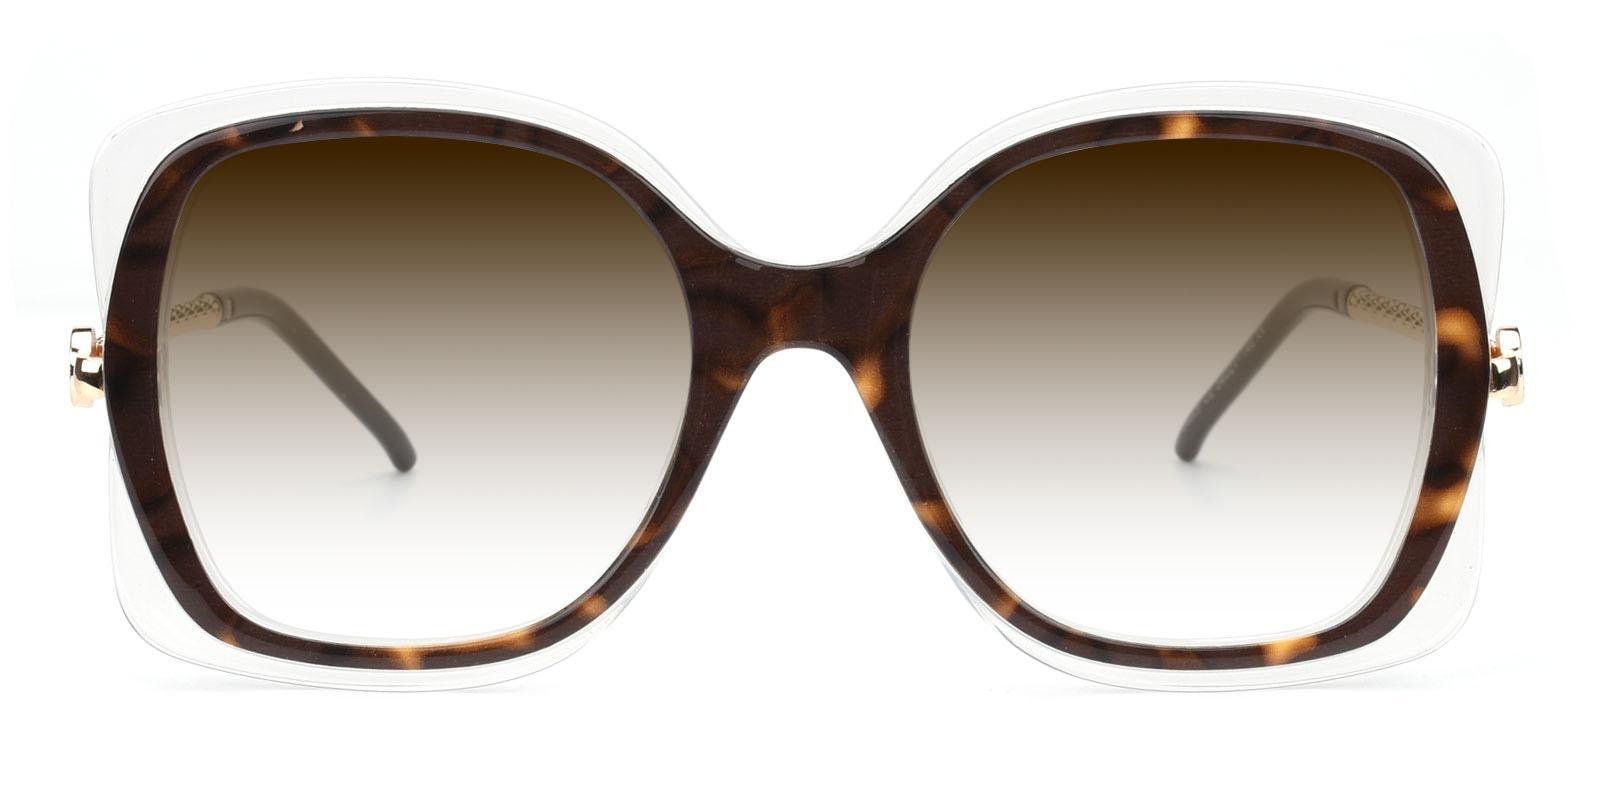 Belinda-Tortoise-Square-Plastic-Sunglasses-detail